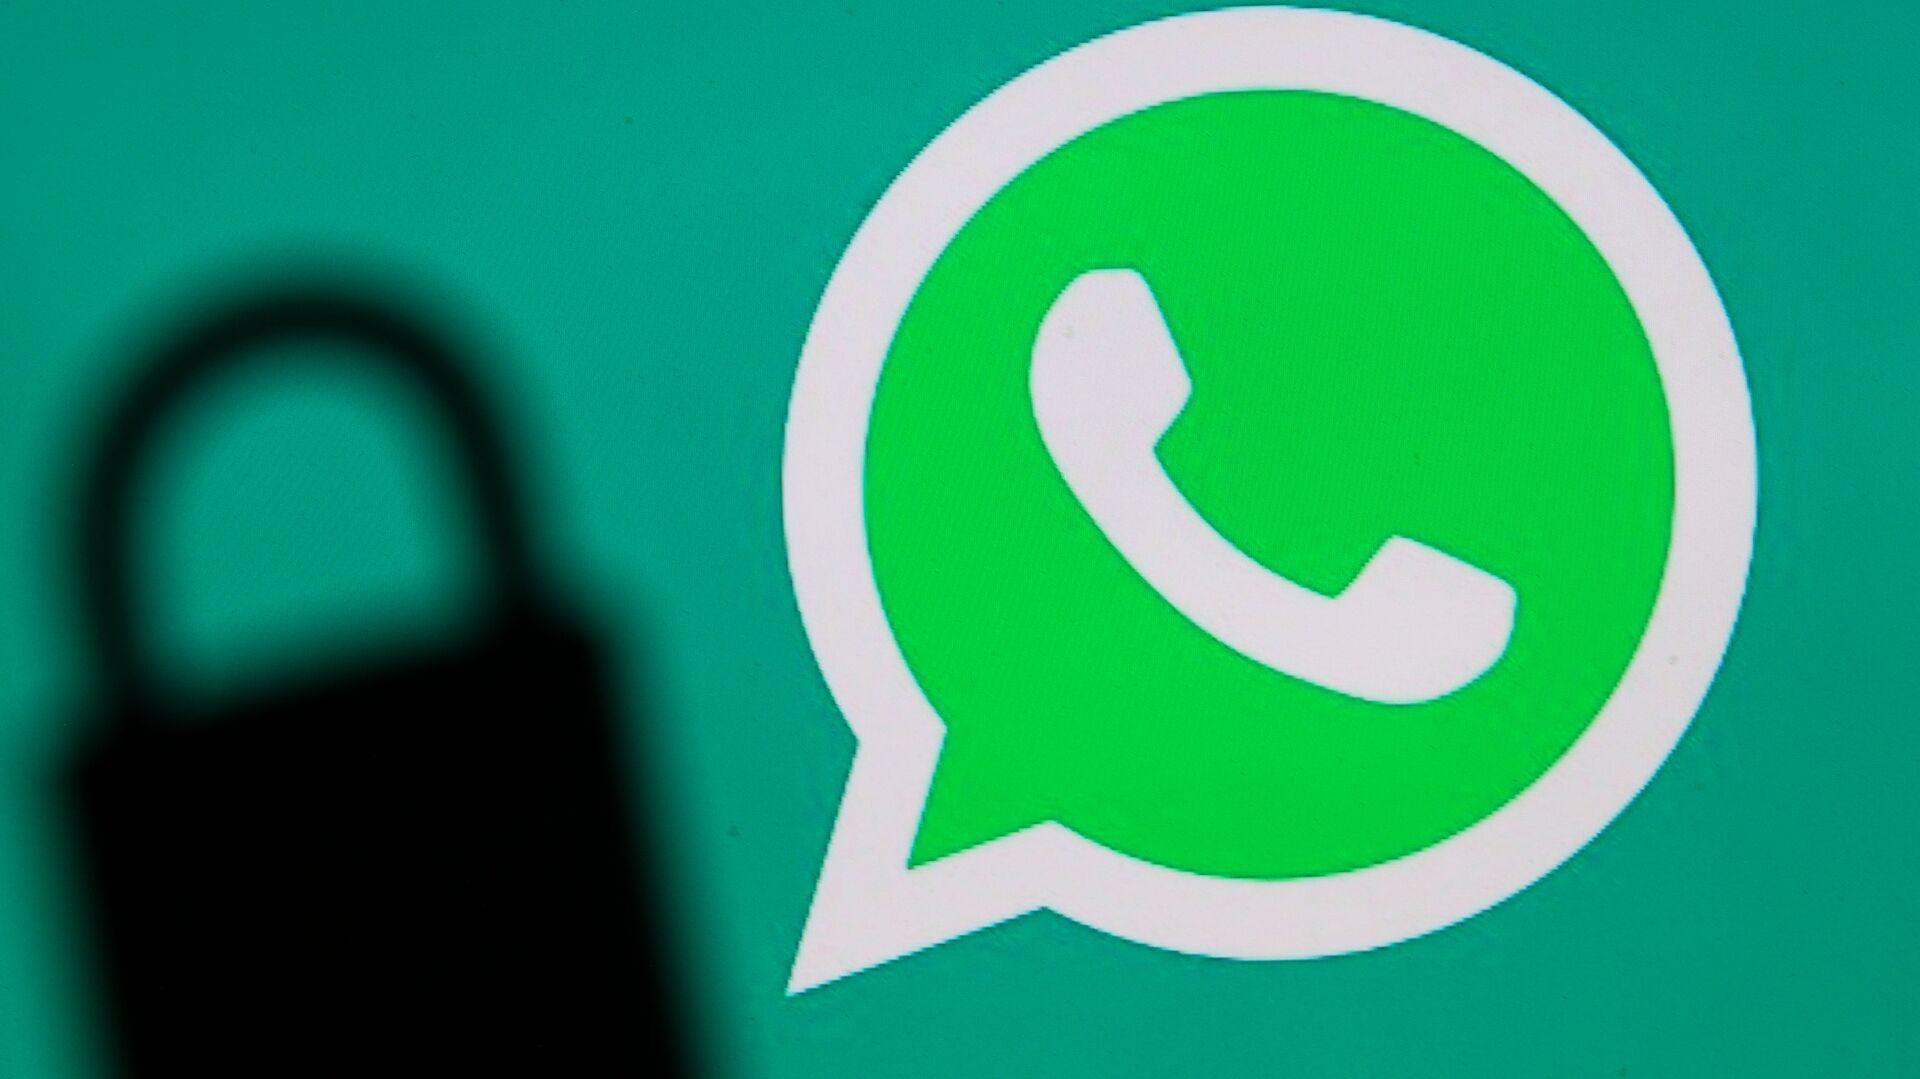 Логотип мессенджера WhatsApp и тень от замка - Sputnik Česká republika, 1920, 29.07.2021